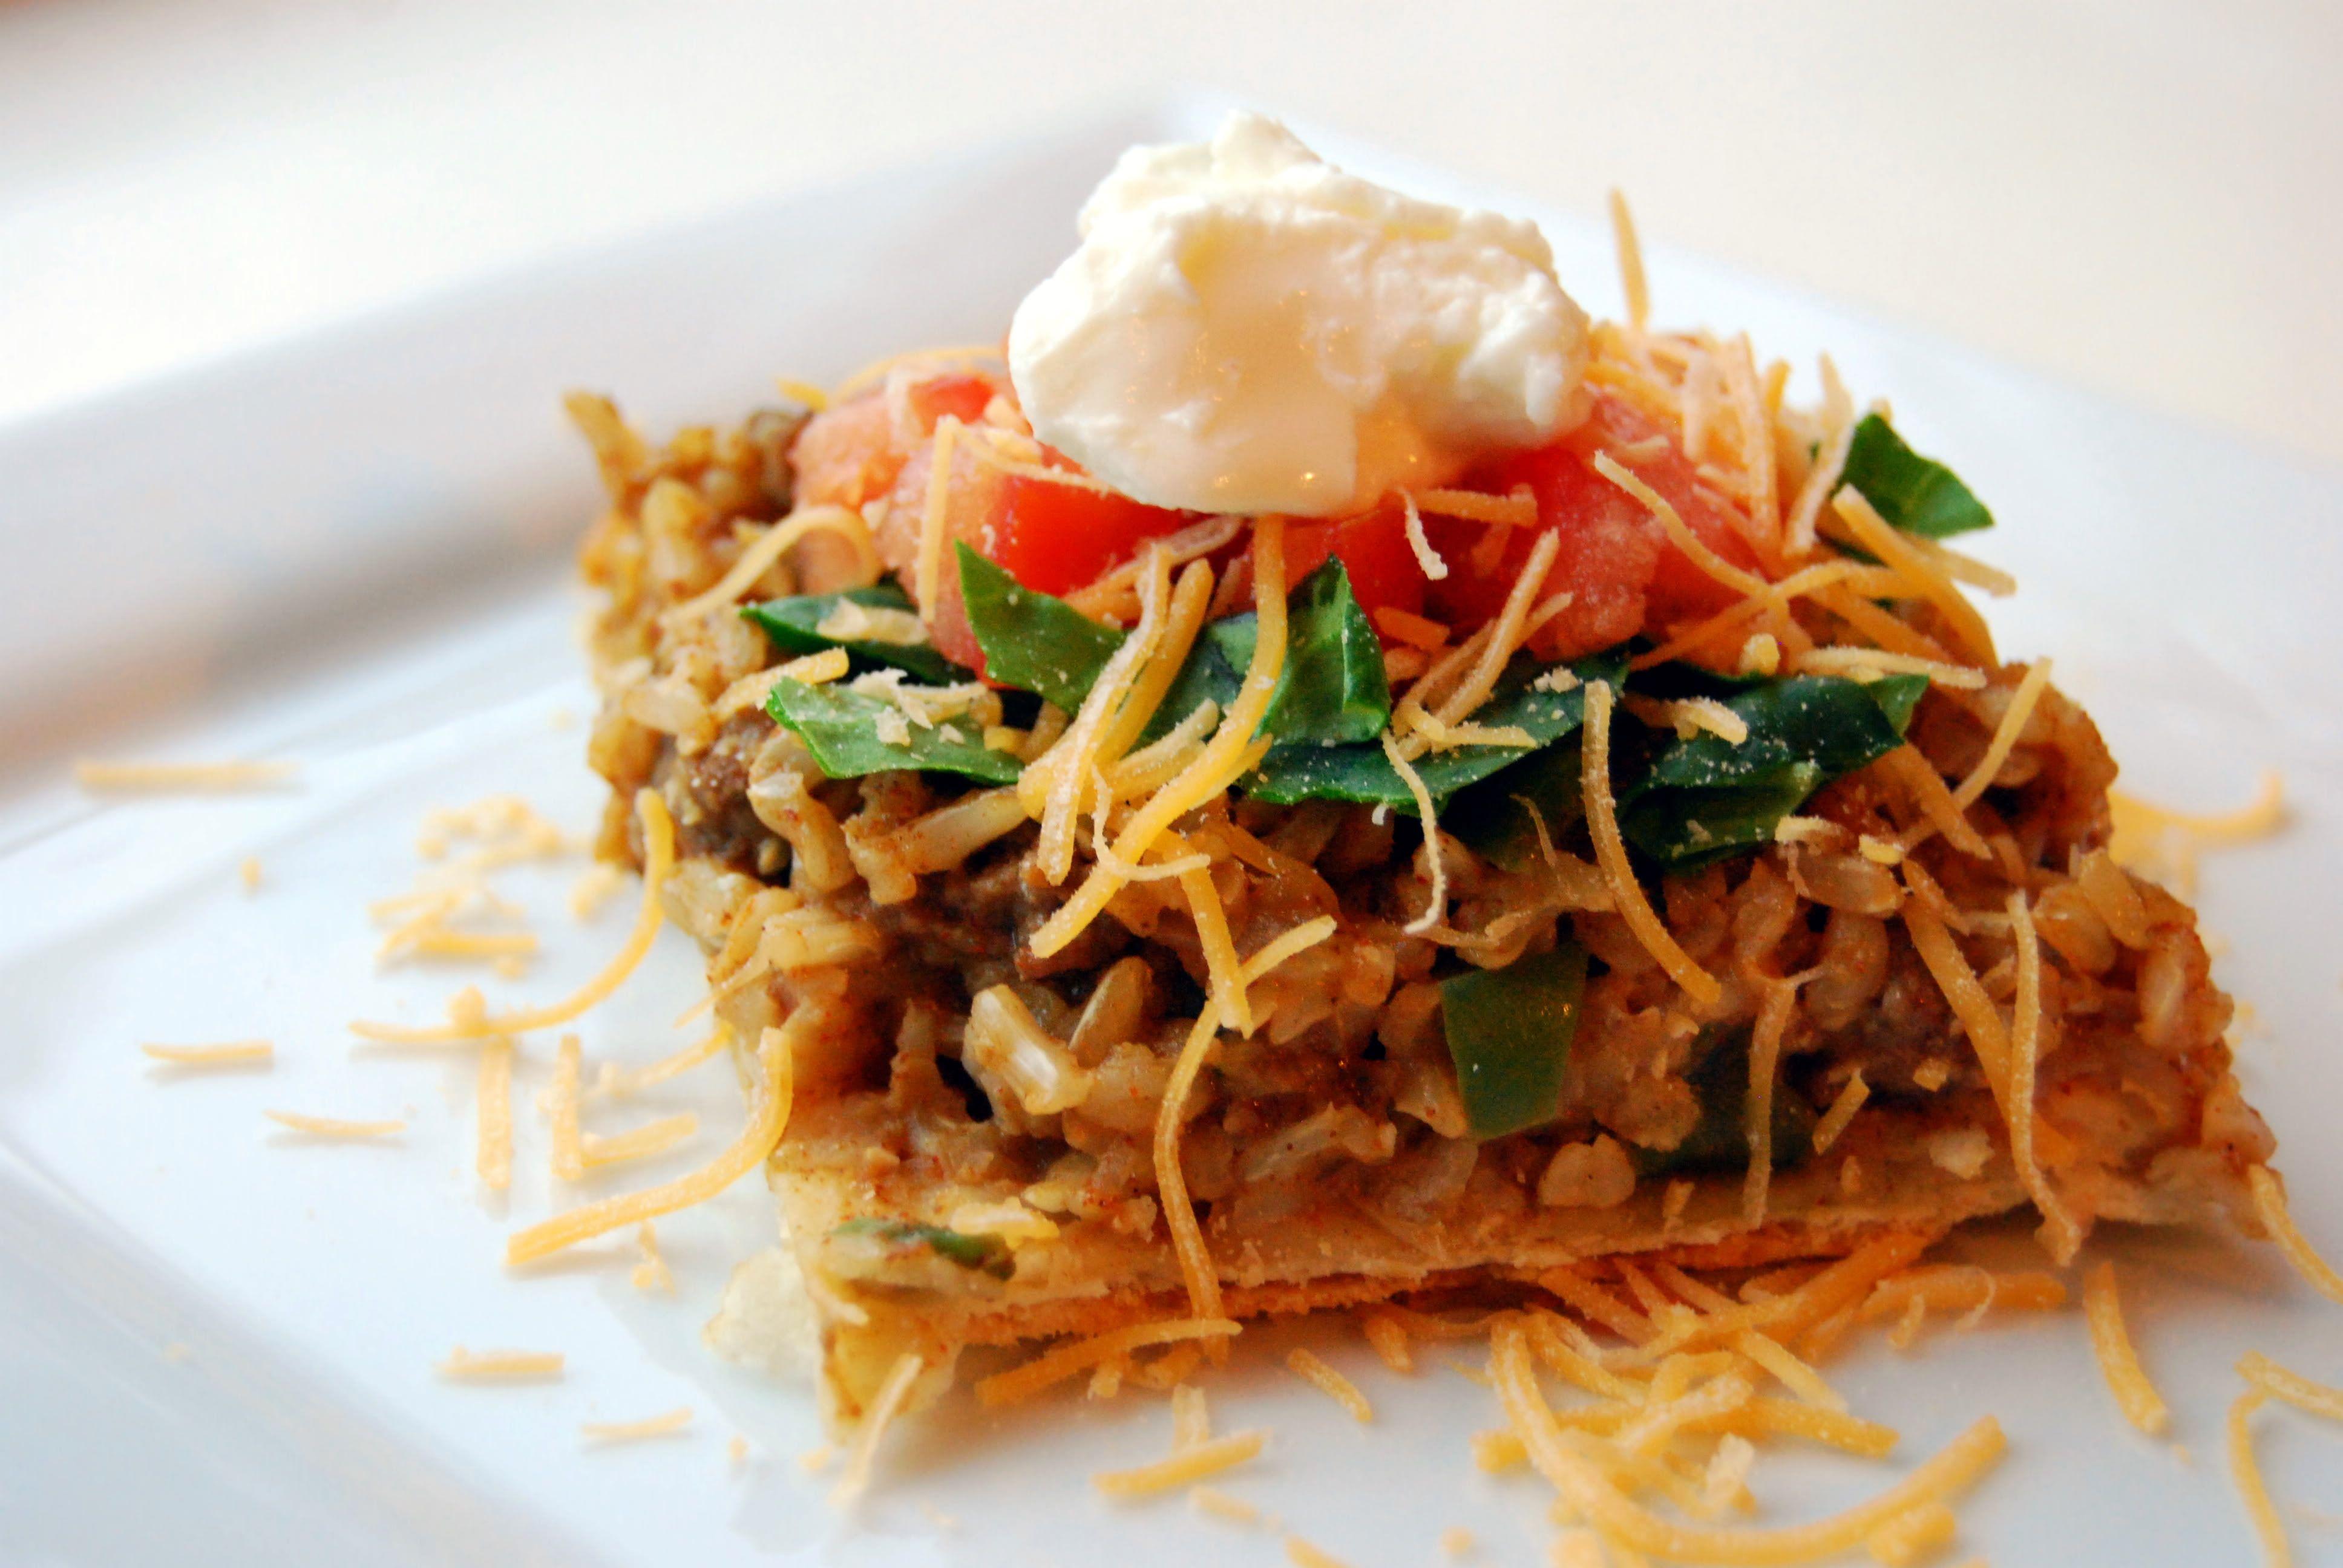 Food Friday: Hearty Taco Casserole - The Sisterhood of the Shrinking Jeans LLC